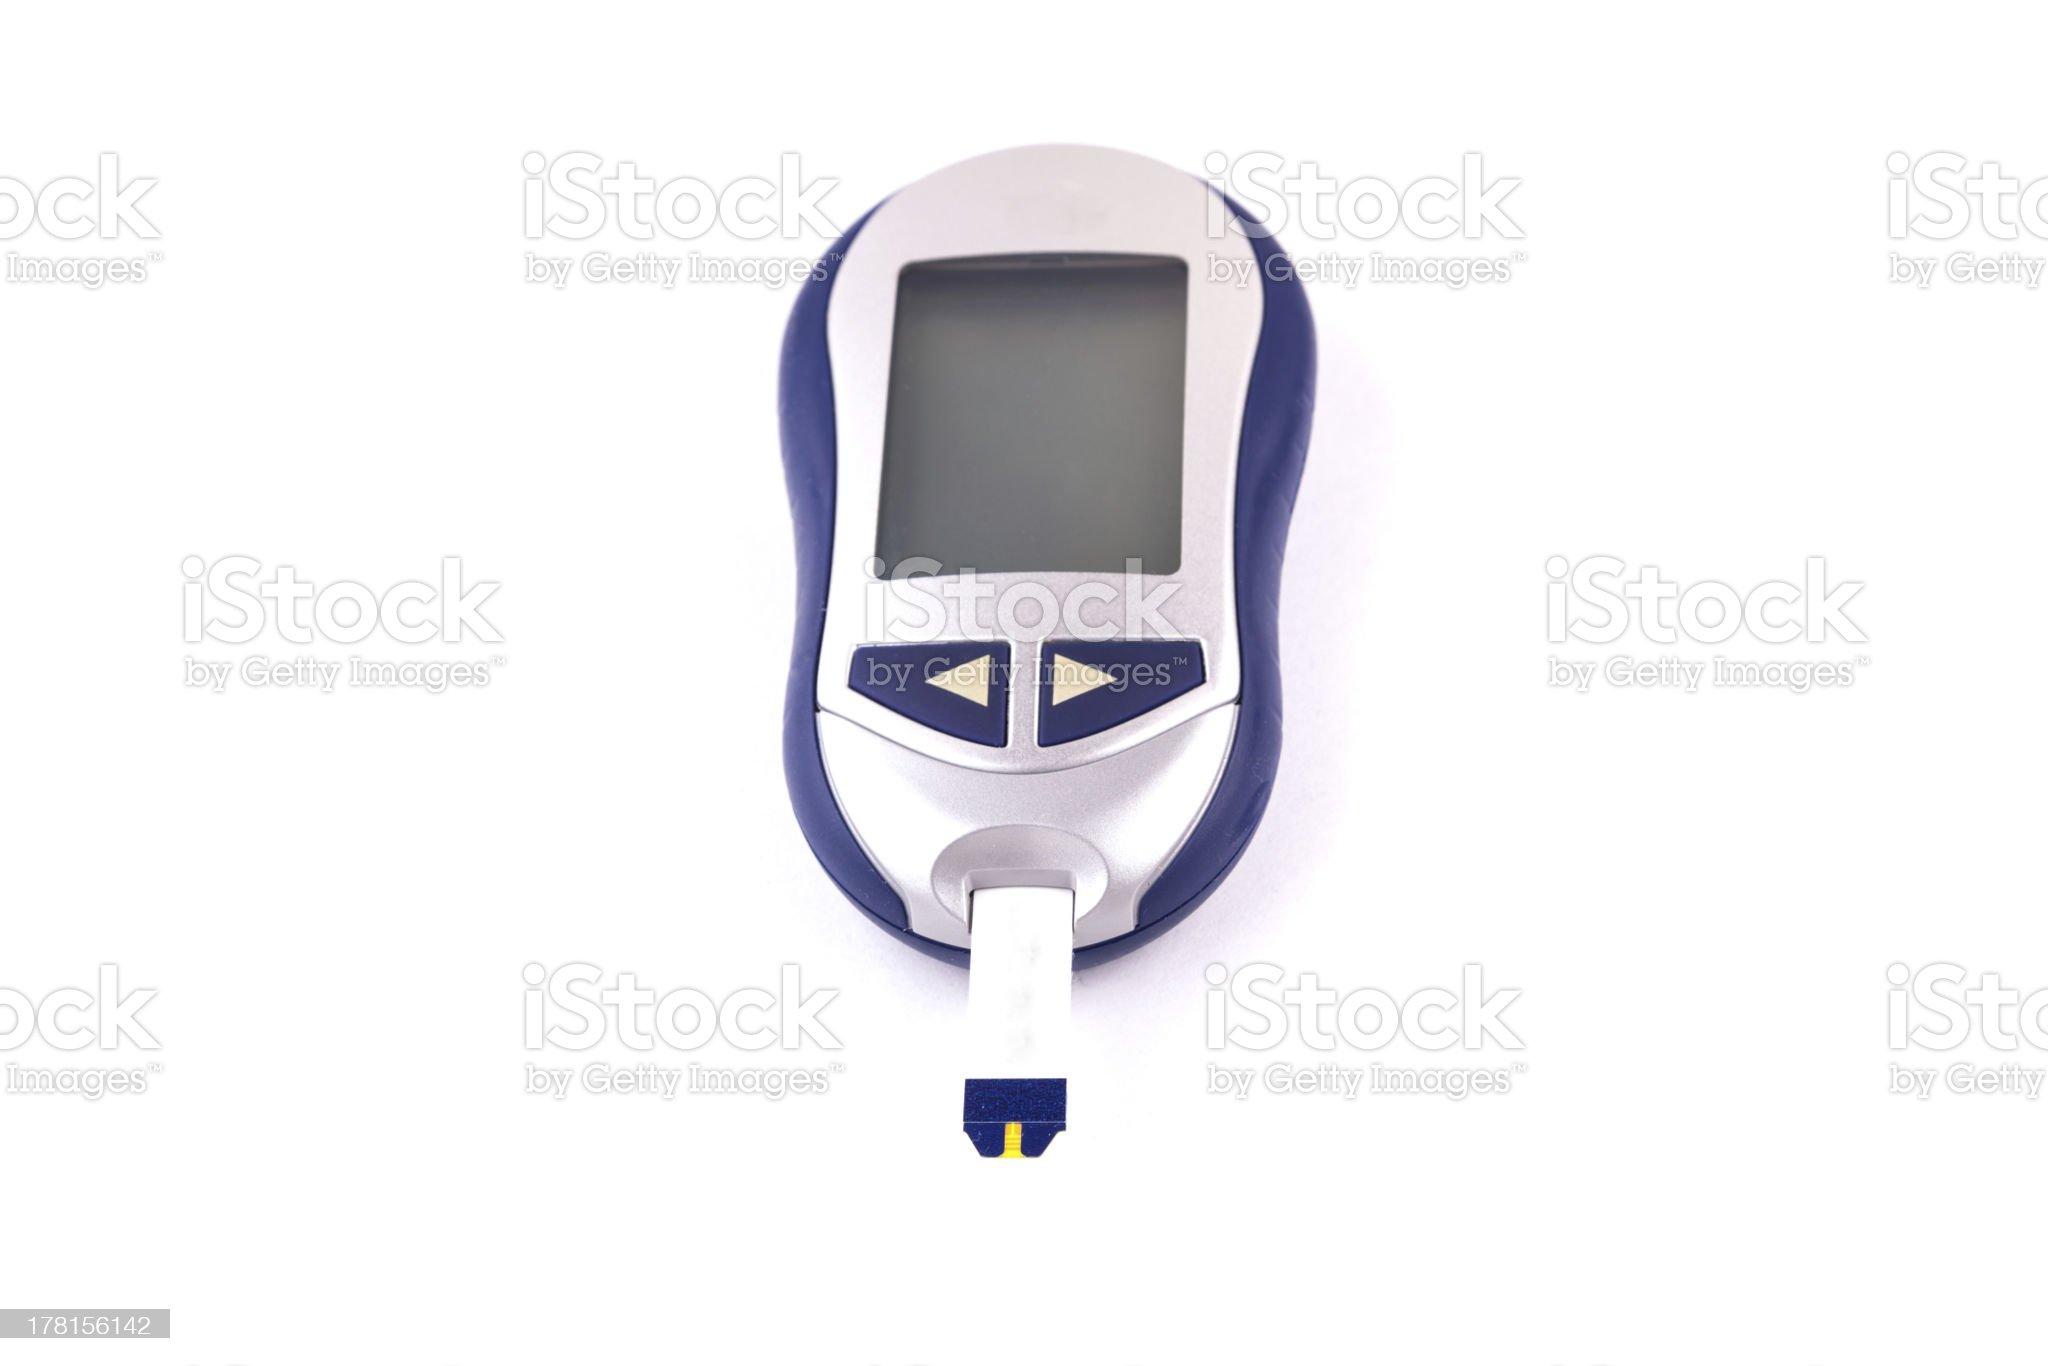 glucose meter royalty-free stock photo